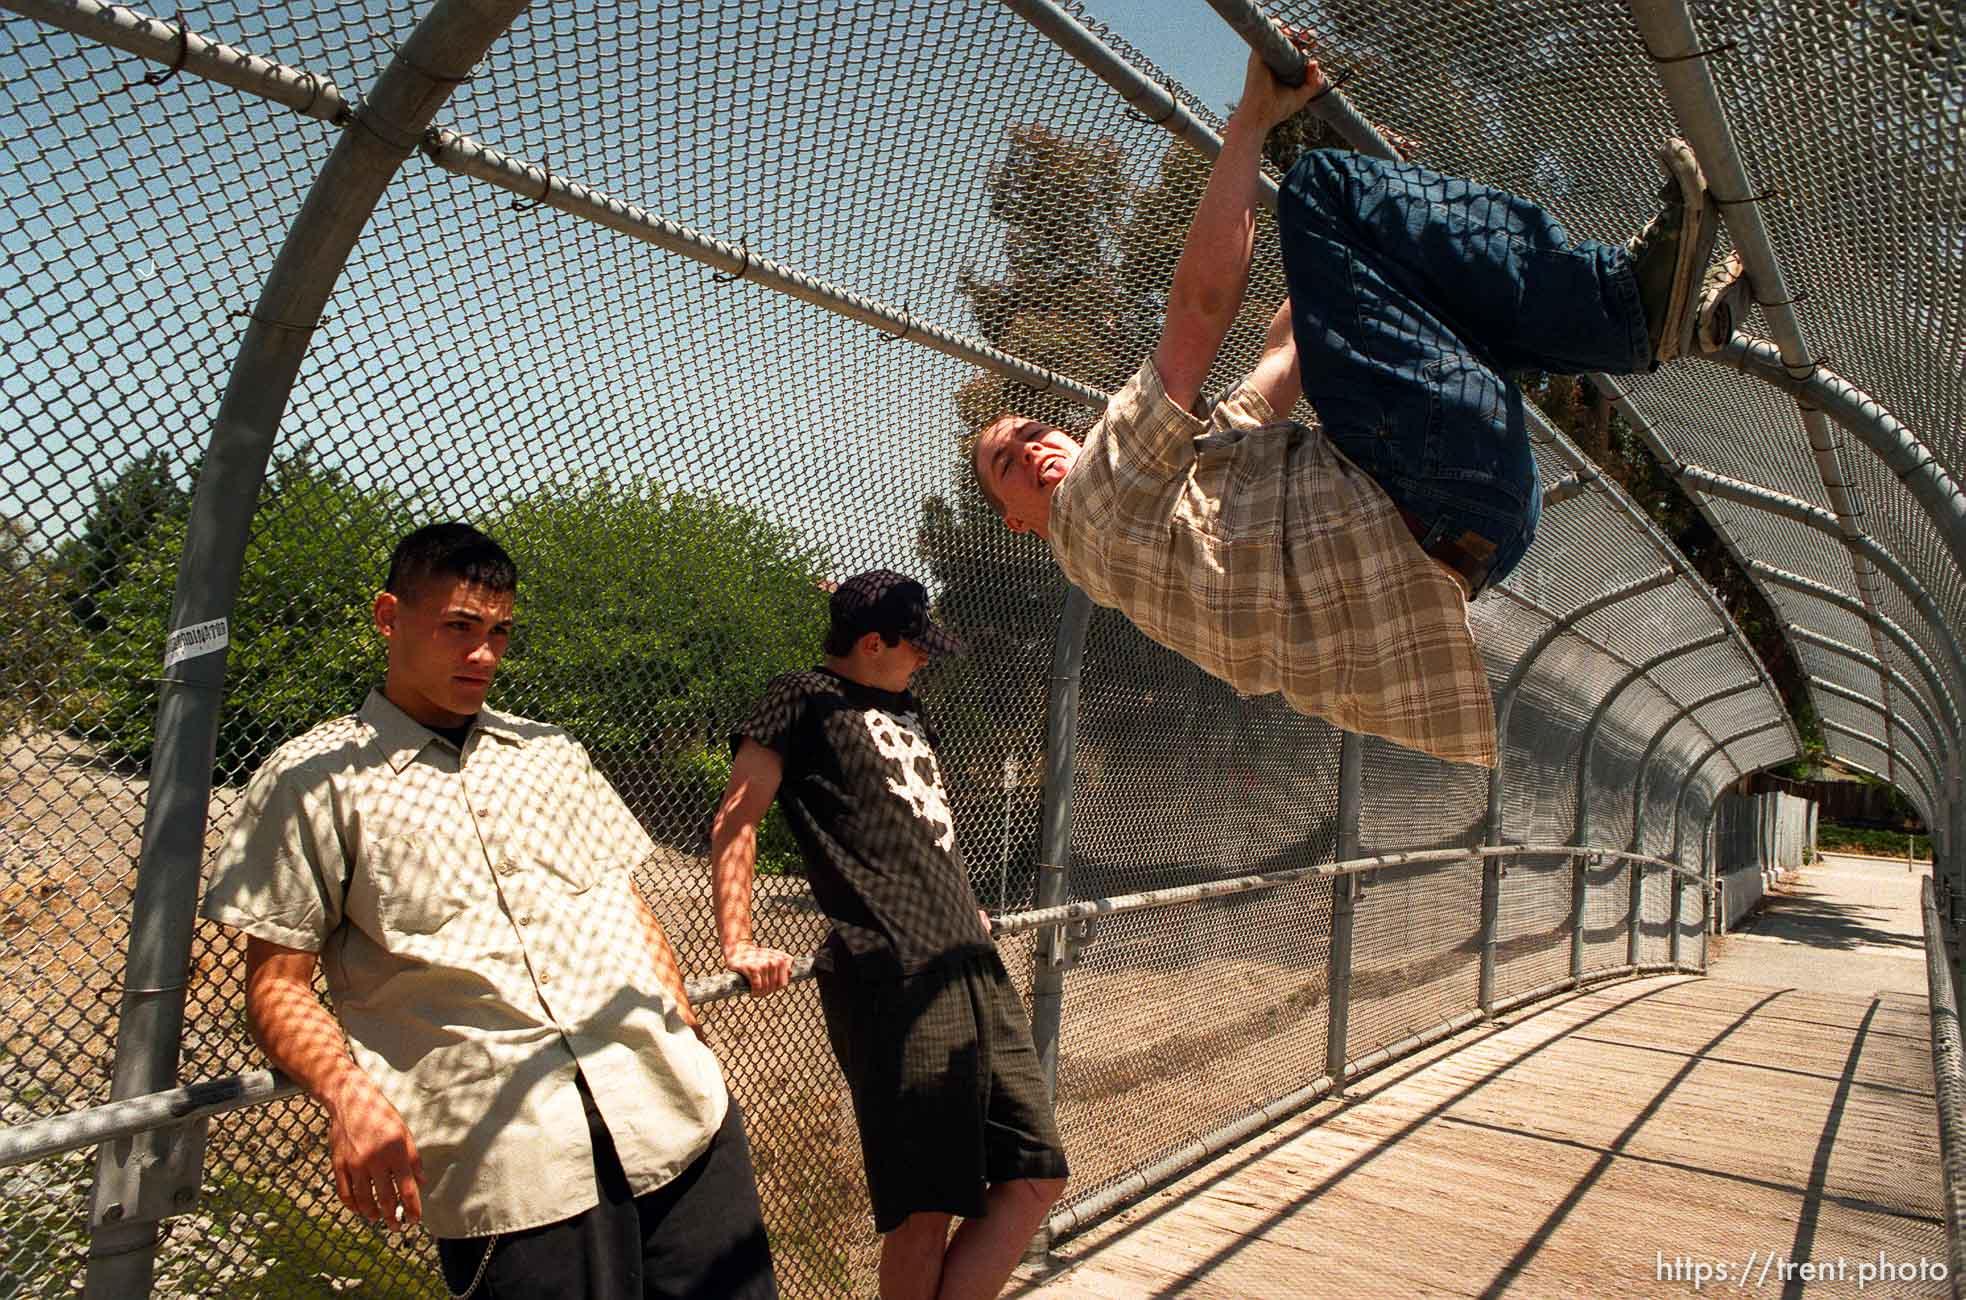 Colby Buzzell, Peter Hansen on the bridge. Insubordinator staff shot